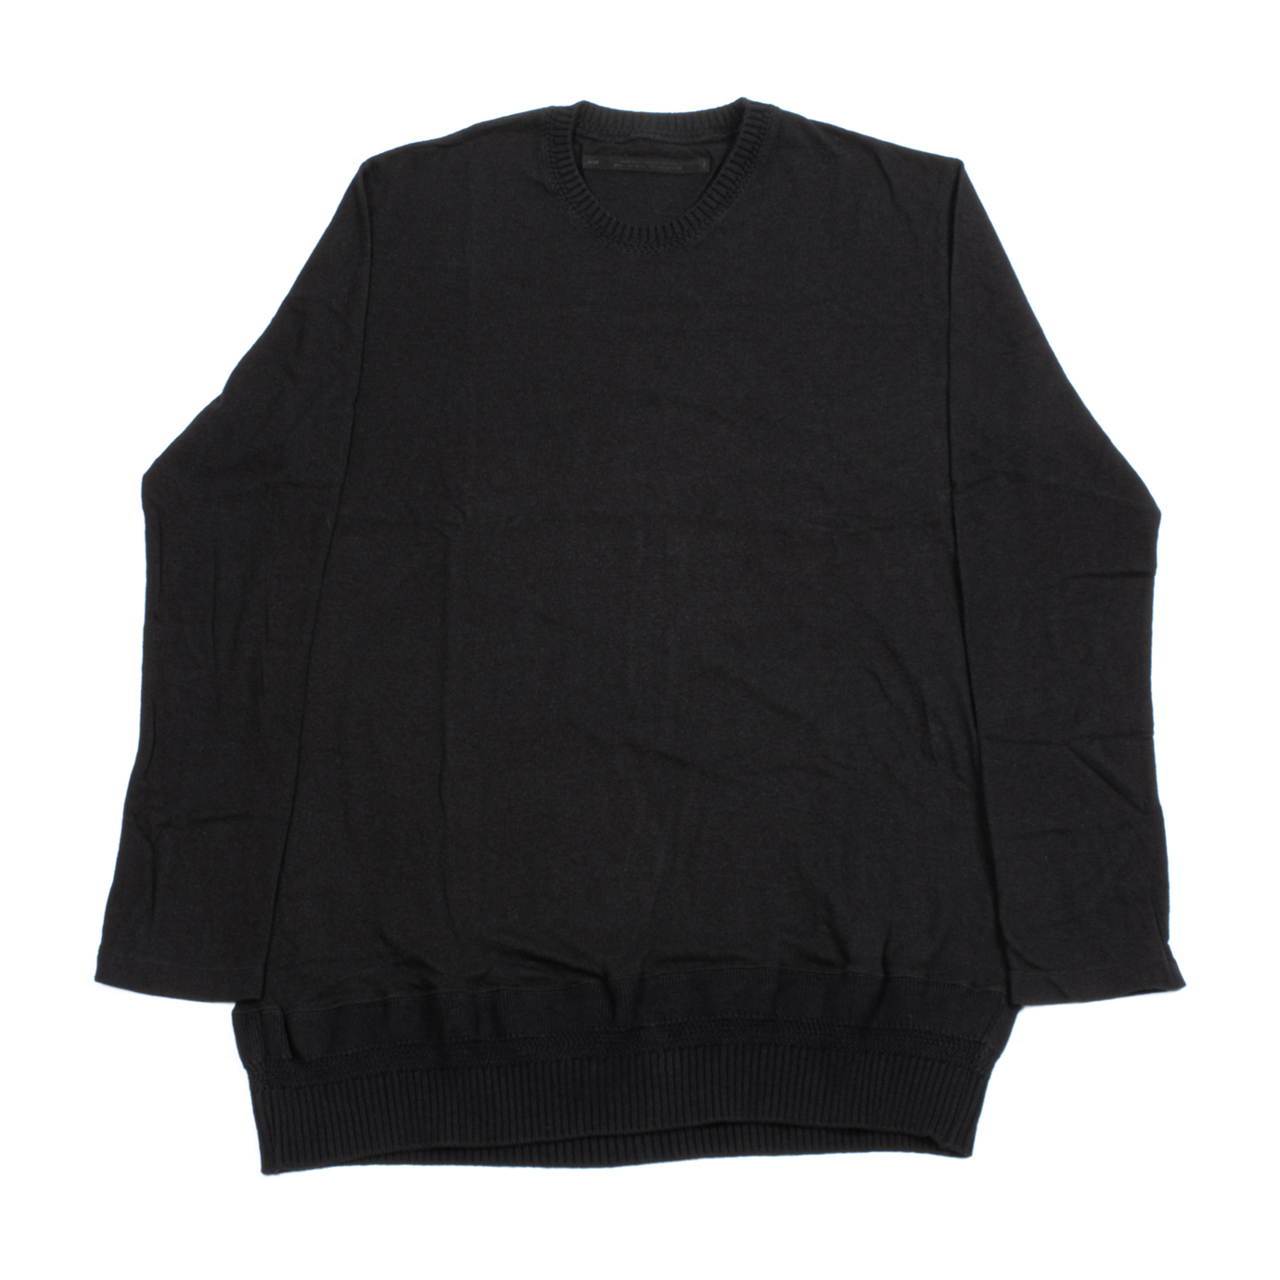 717CUM8-BLACK / ニットスリーブ Tシャツ